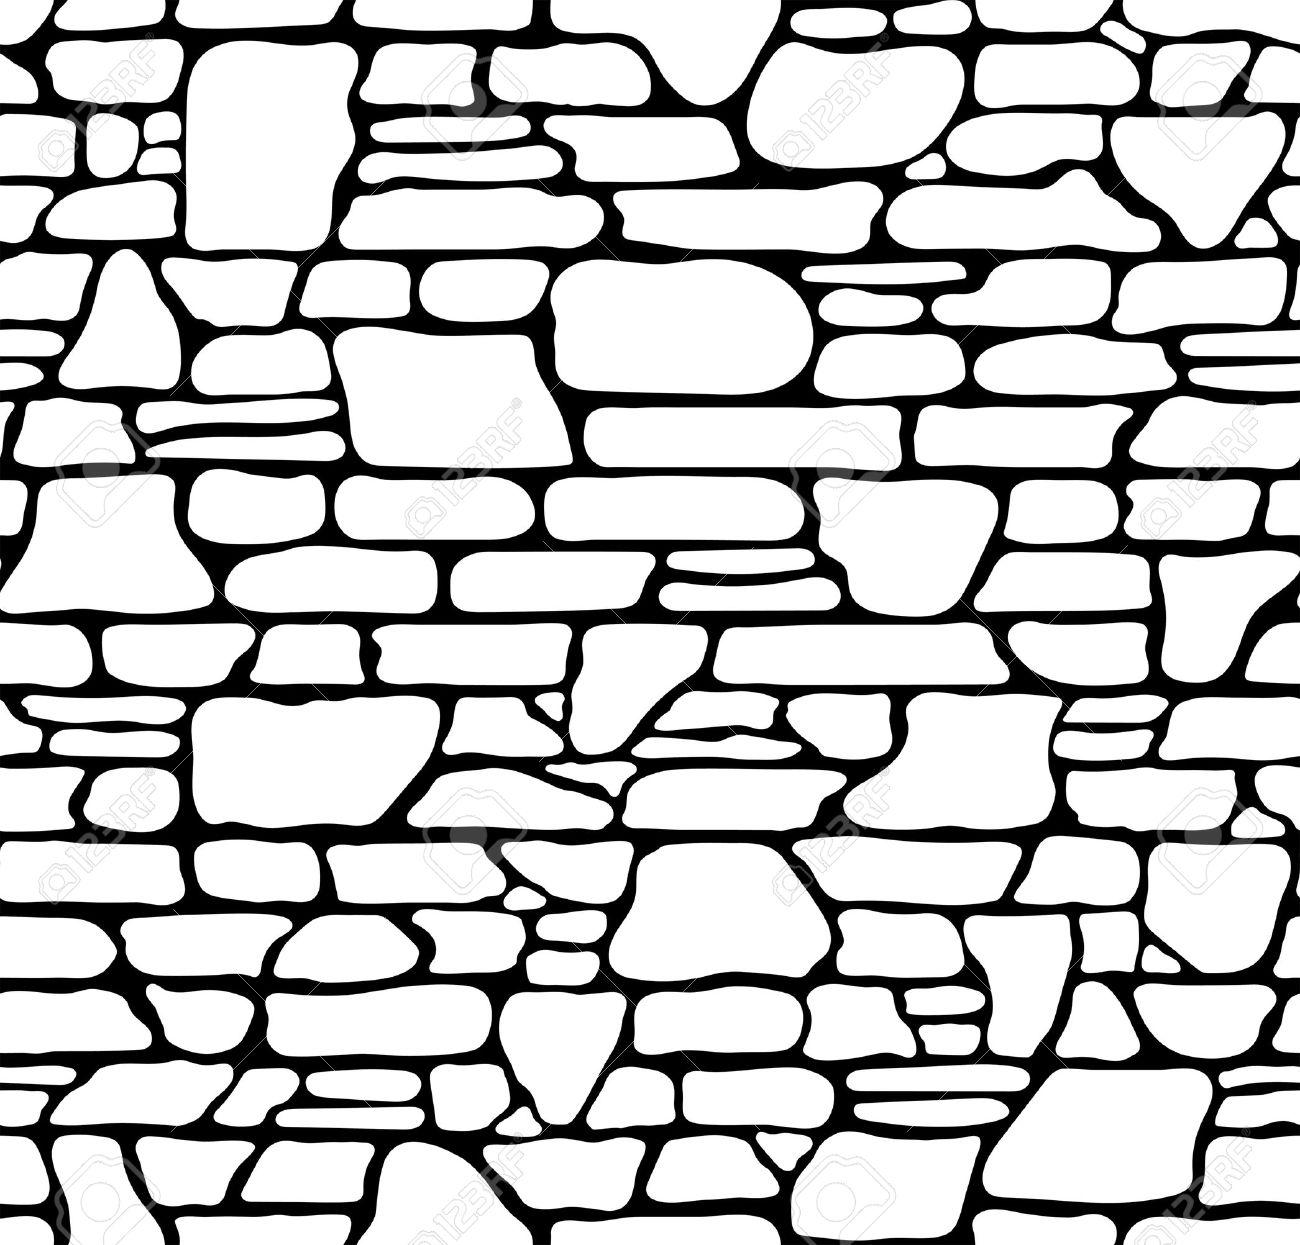 1300x1245 Seamless Grunge Stone Brick Wall Texture. Vector Illustration